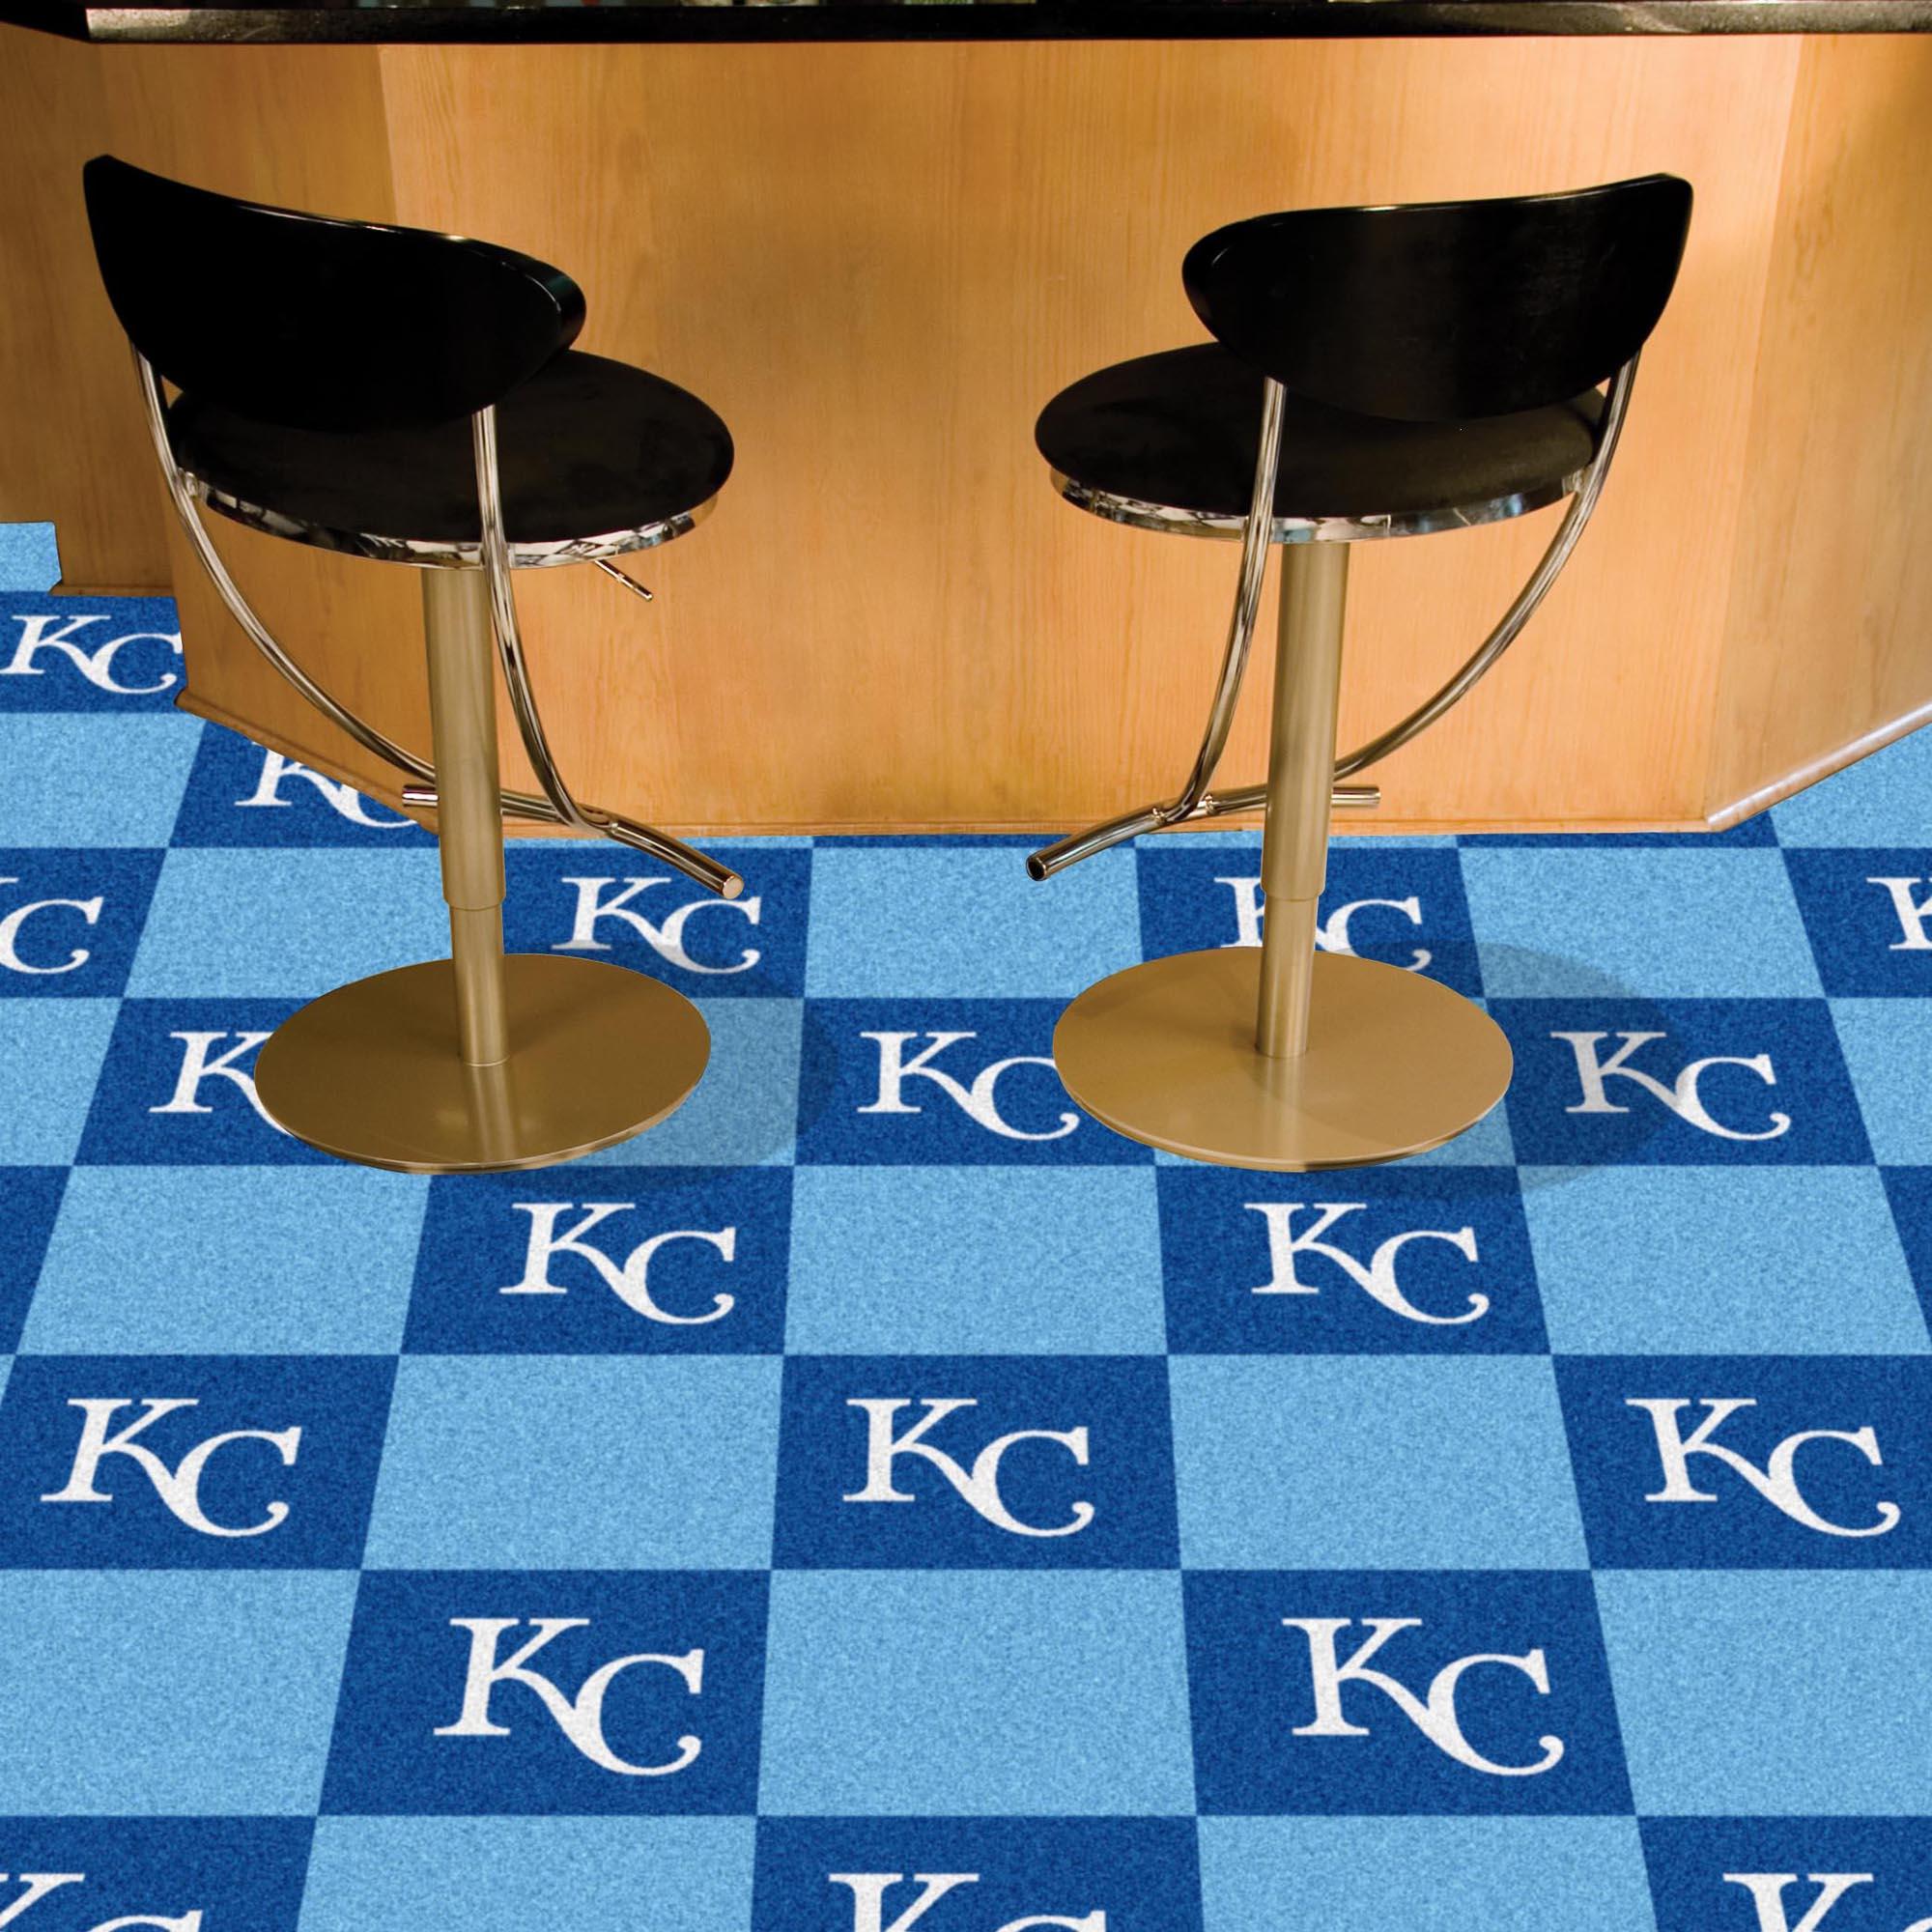 Kansas City Royals Carpet Tiles 18x18 In Buy At Khc Sports